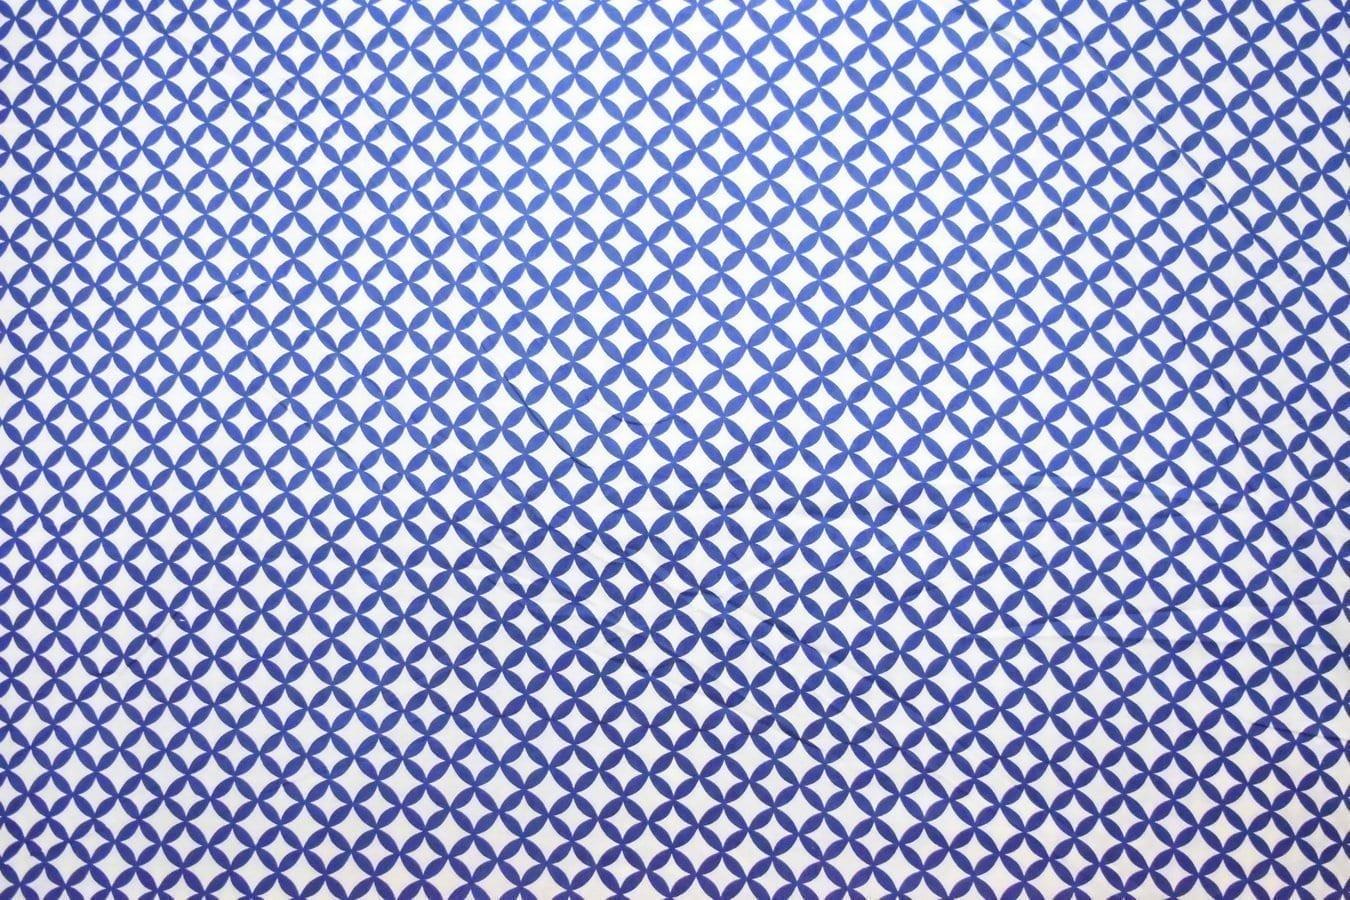 Dark Blue / white COTTON PRINTED FABRIC for Multipurpose use PC378 2